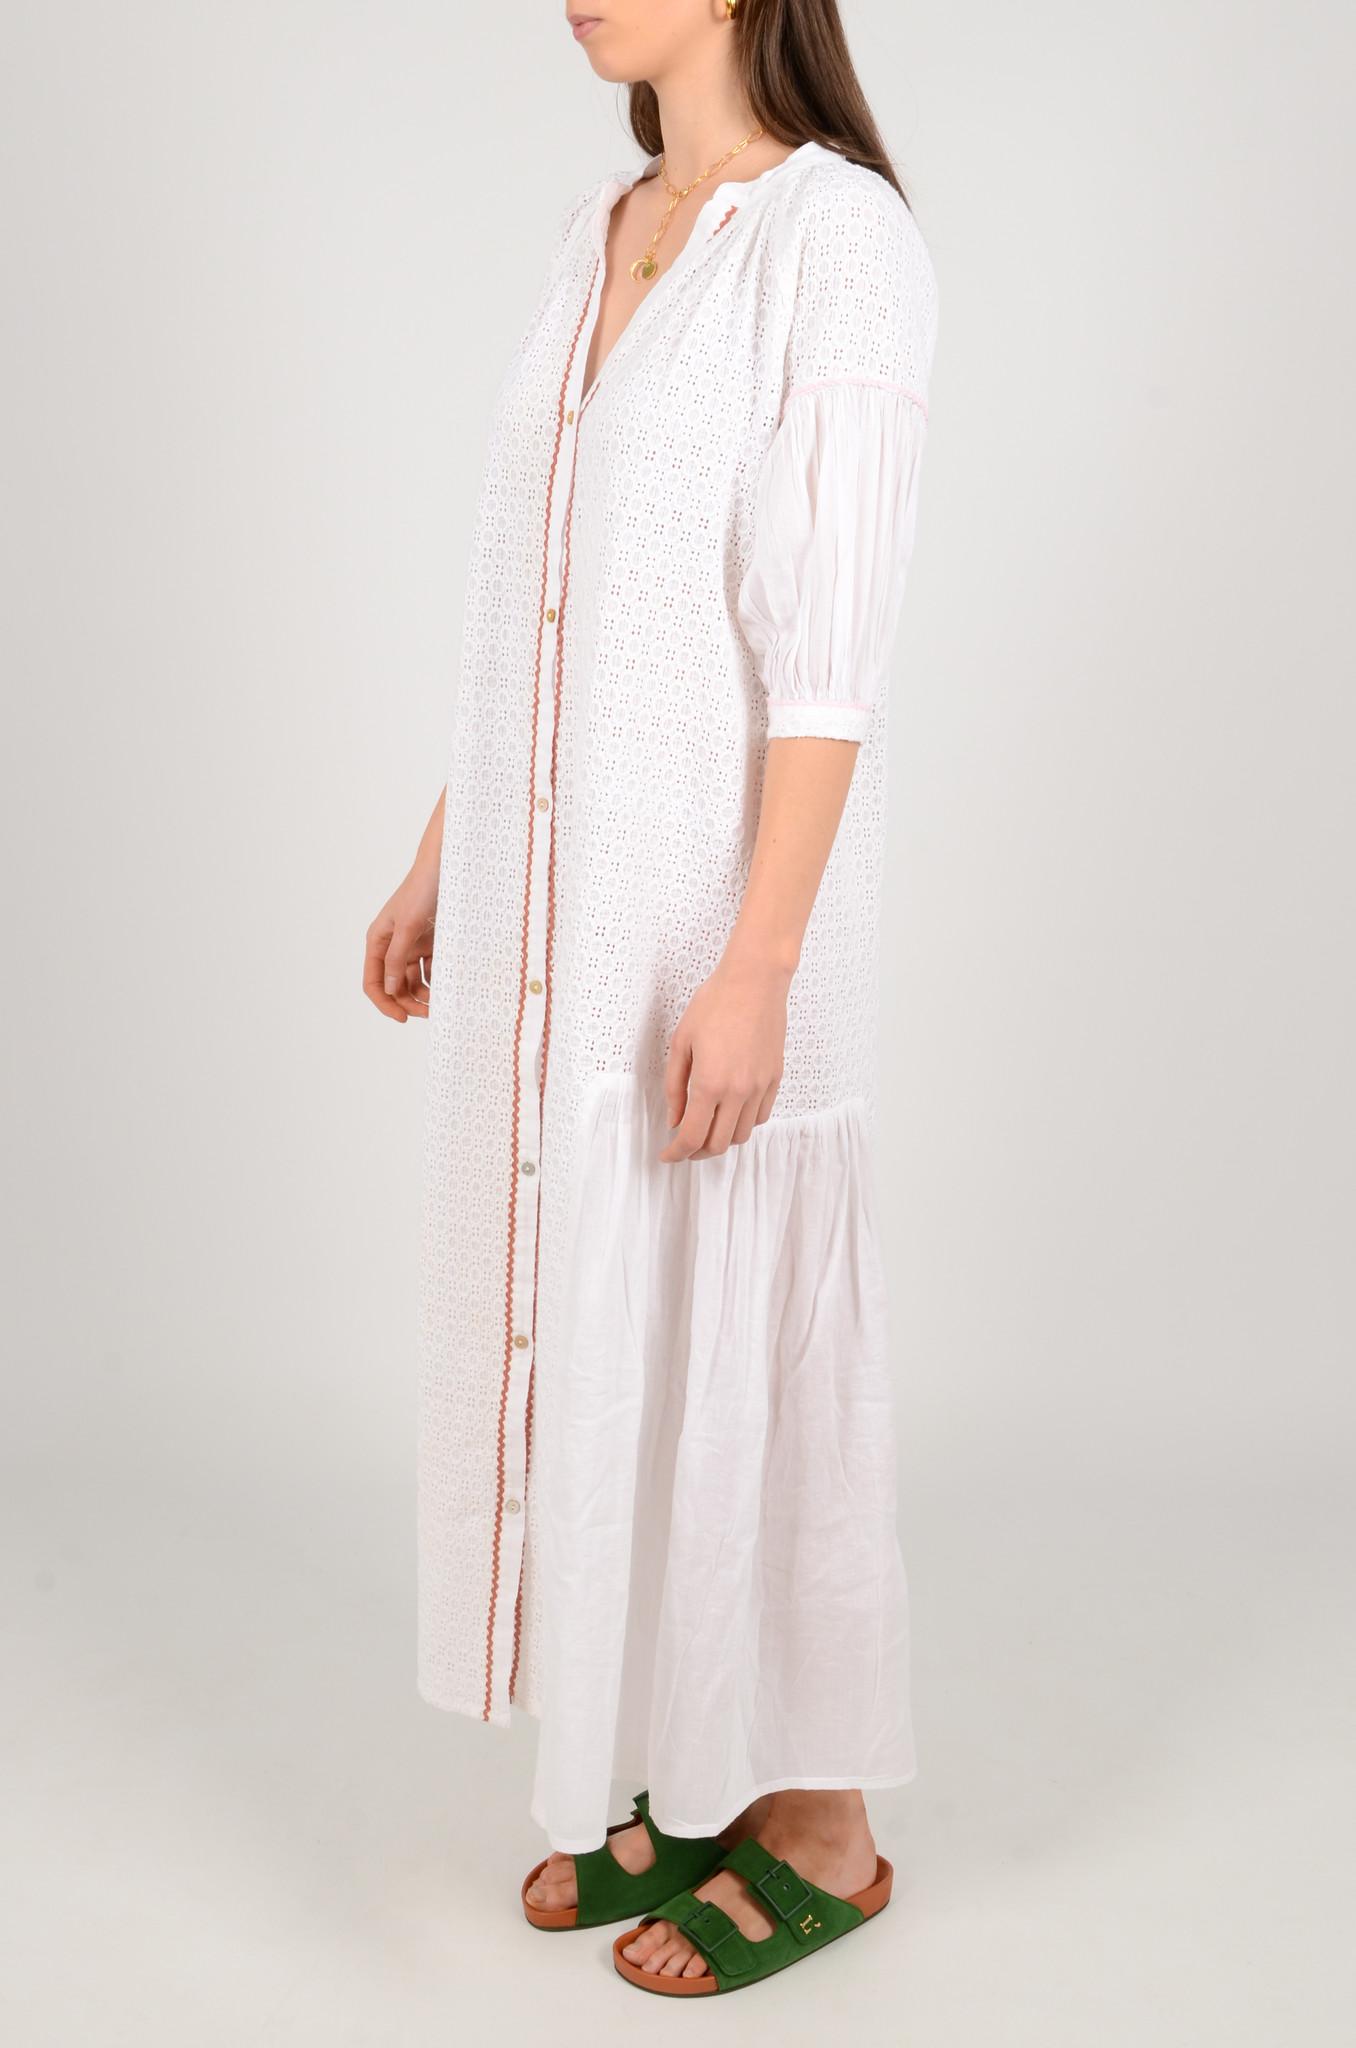 MANISE DRESS-3